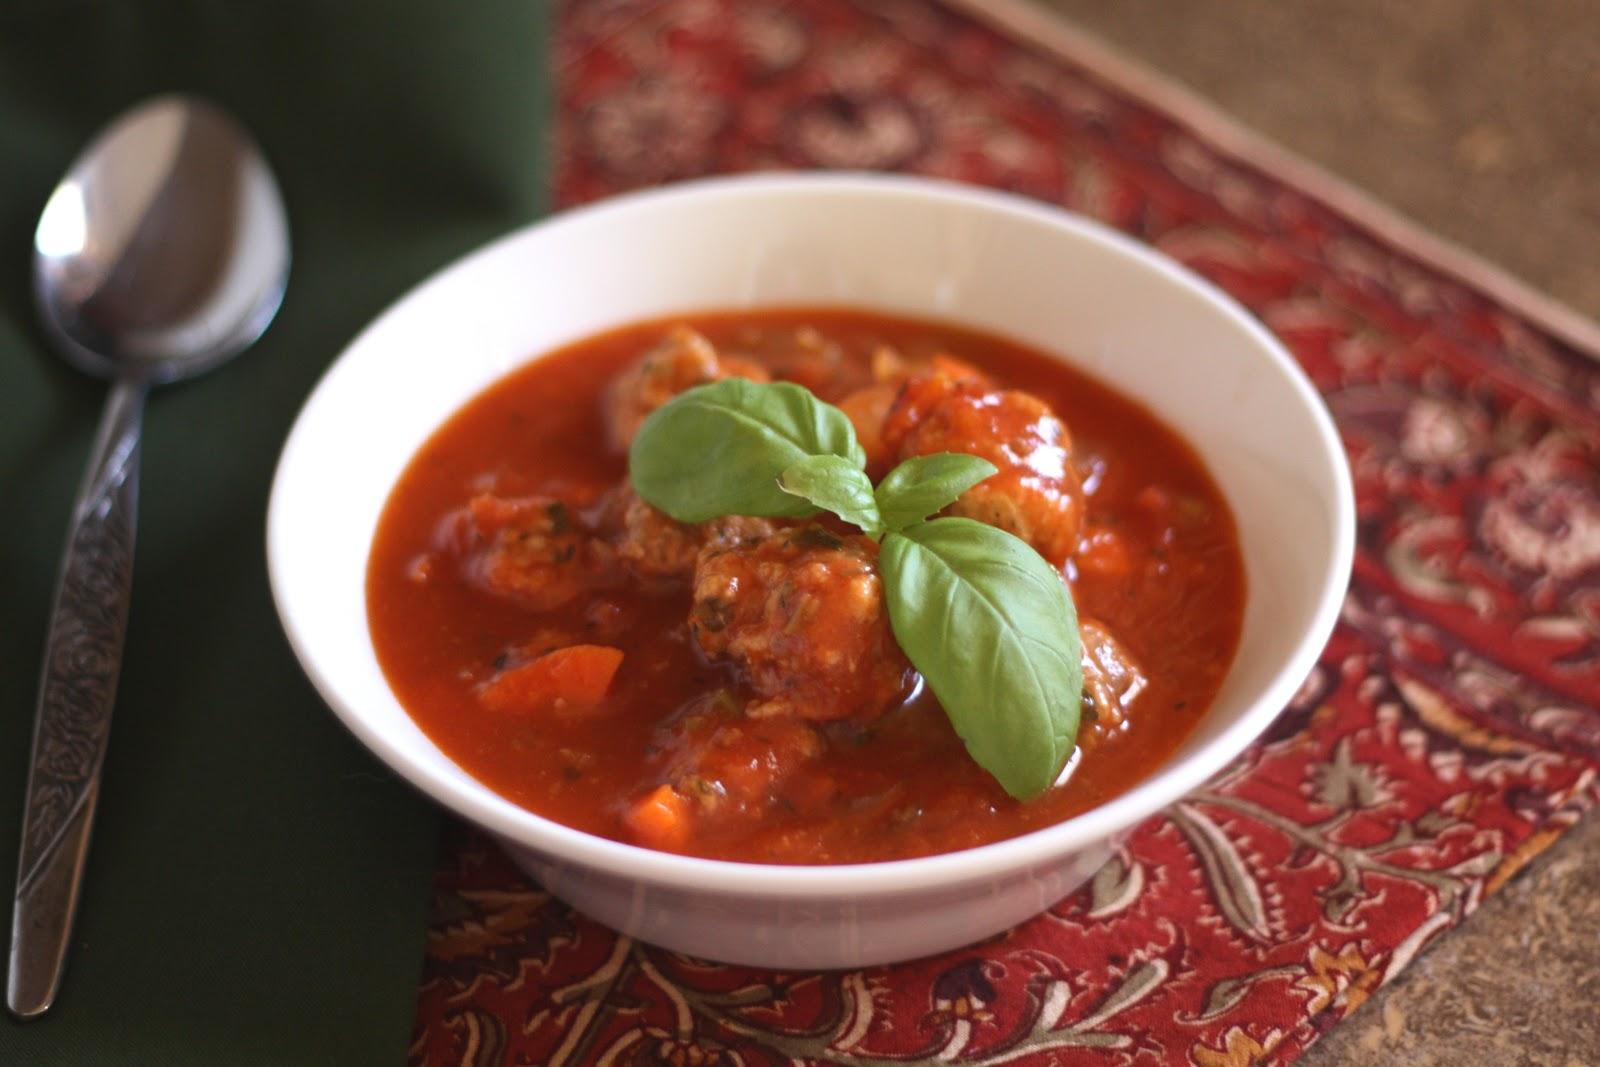 Barefeet In The Kitchen: Italian Meatball Soup